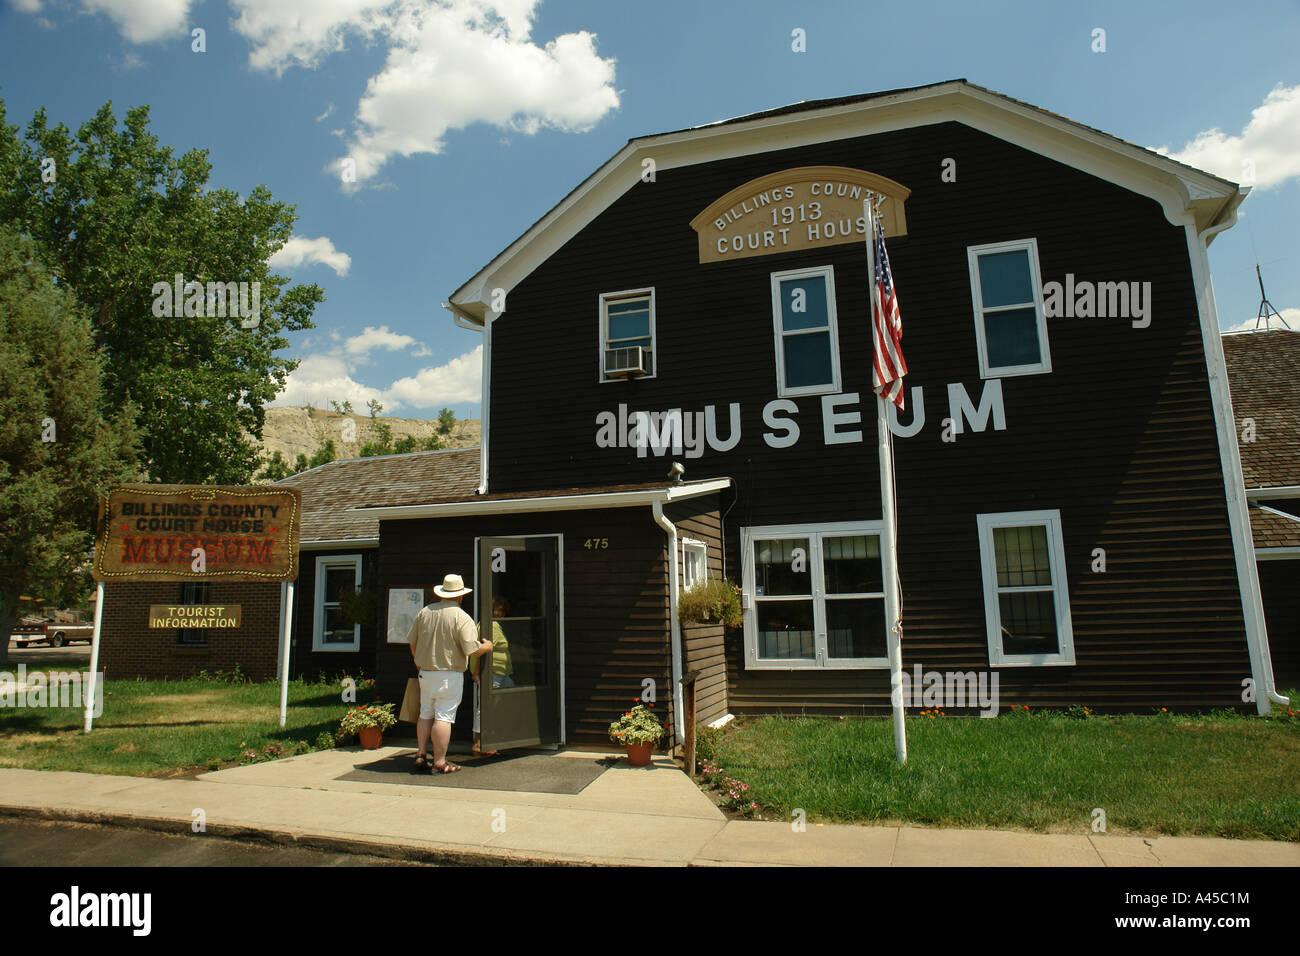 Ajd57306 Medora Nd North Dakota Historic Medora Downtown Stock Photo Royalty Free Image